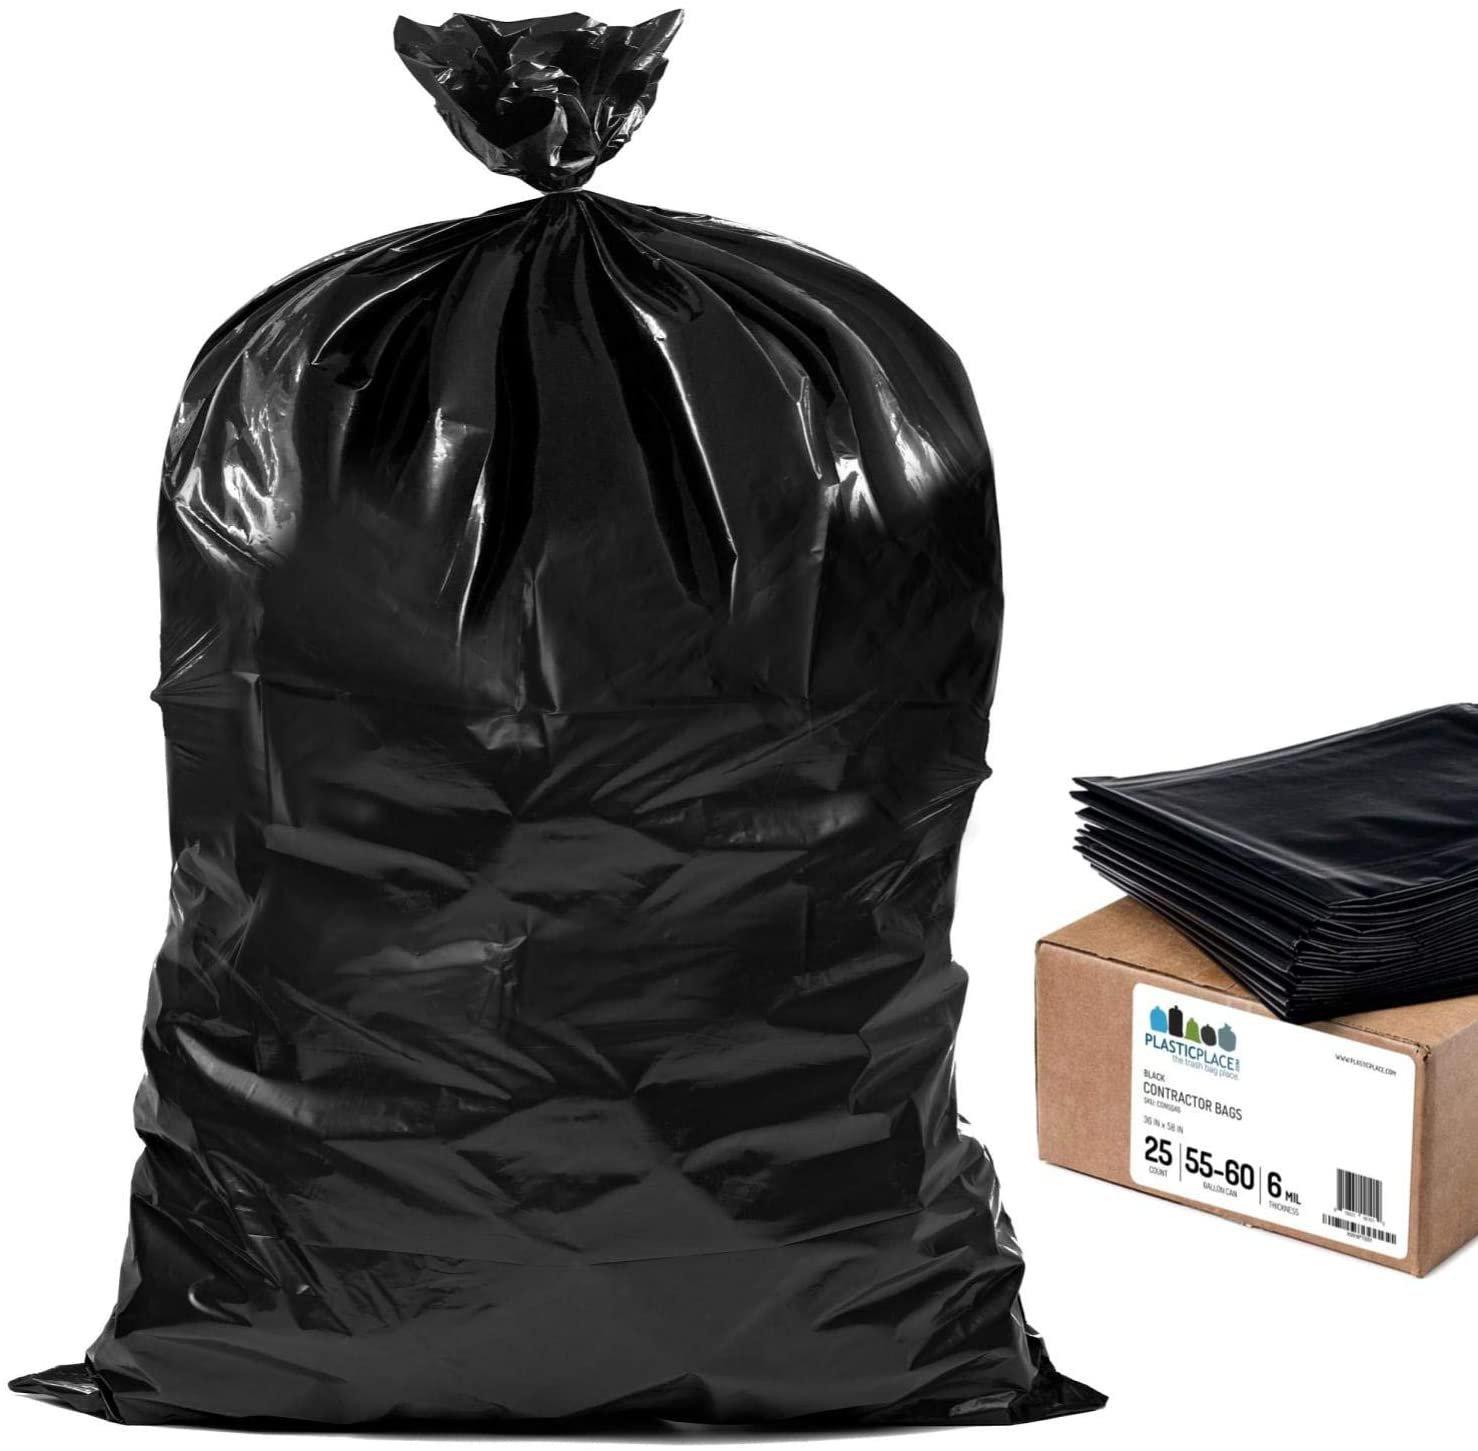 Plasticplace Contractor Trash Bags 55-60 Gallon � 6.0 Mil � Black 25 Count